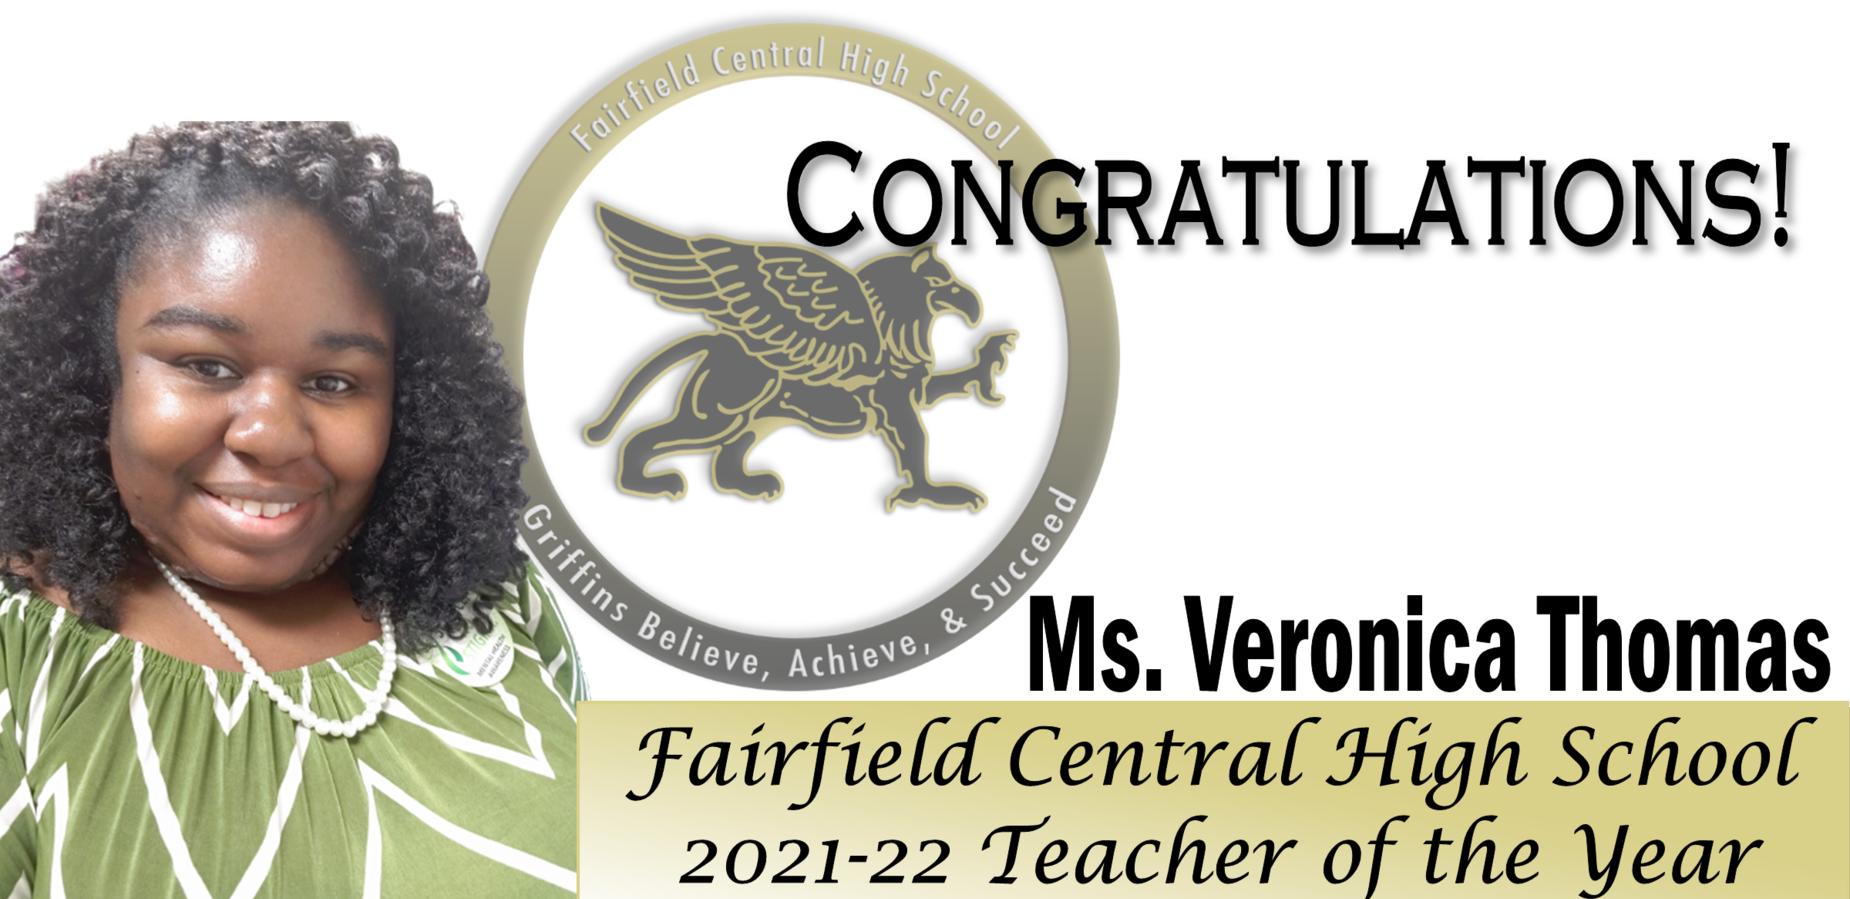 Congratulations! Ms. Veronica Thomas FCHS 2021-22 Teacher of the Year